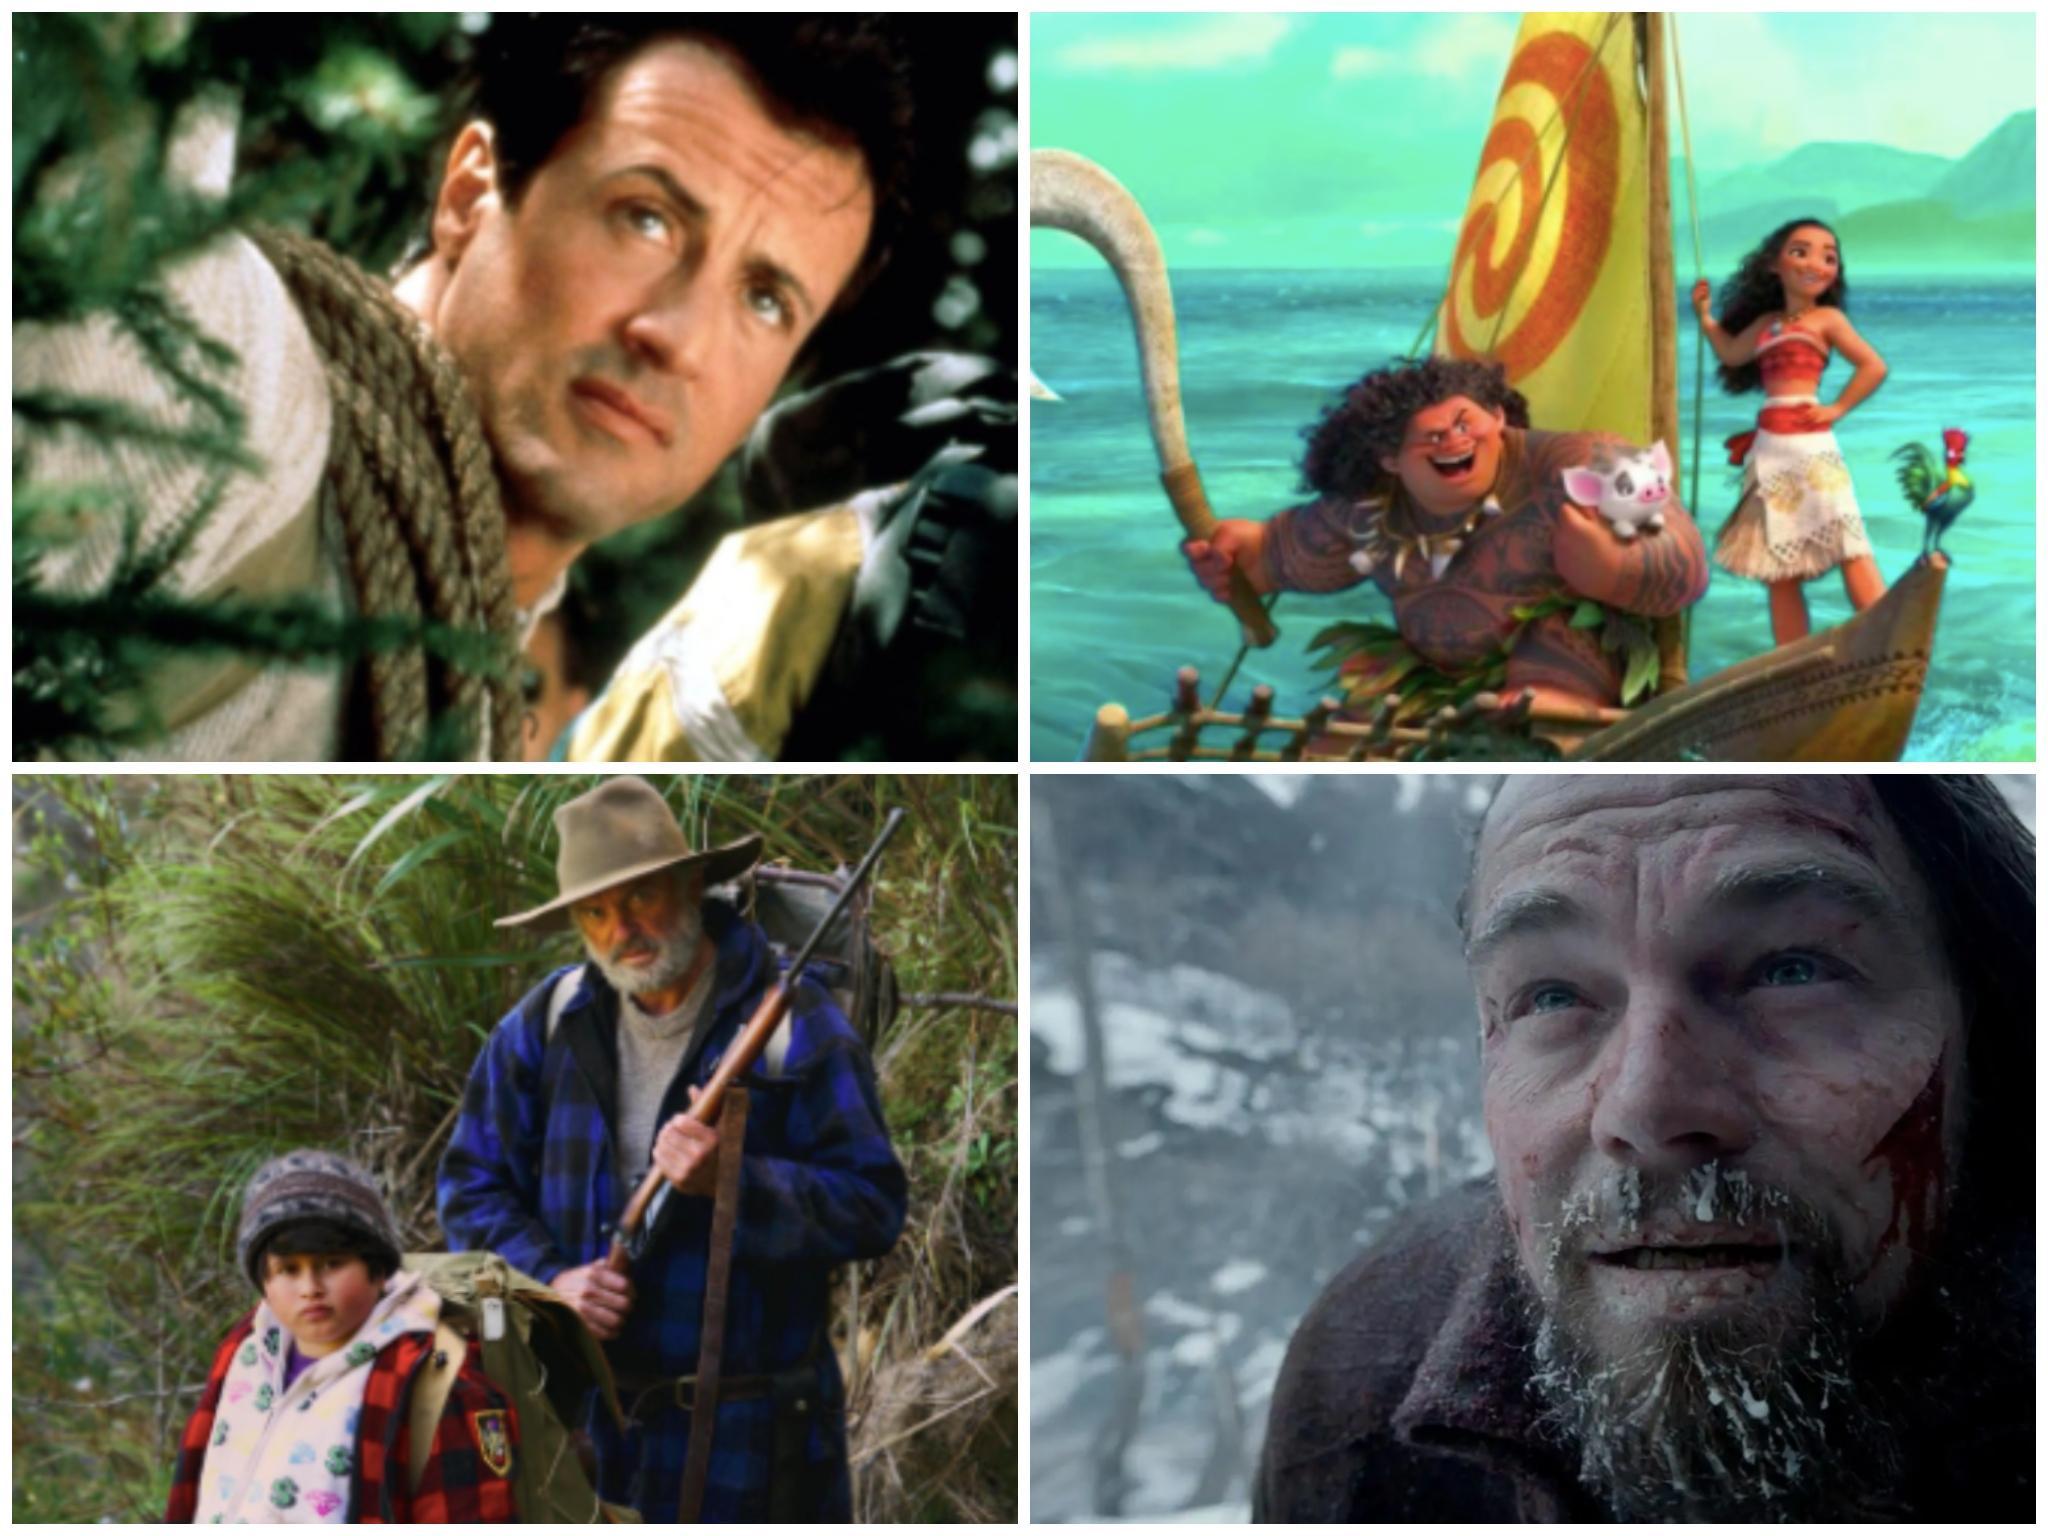 Coronavirus: 23 films set outside to help you through self-isolation